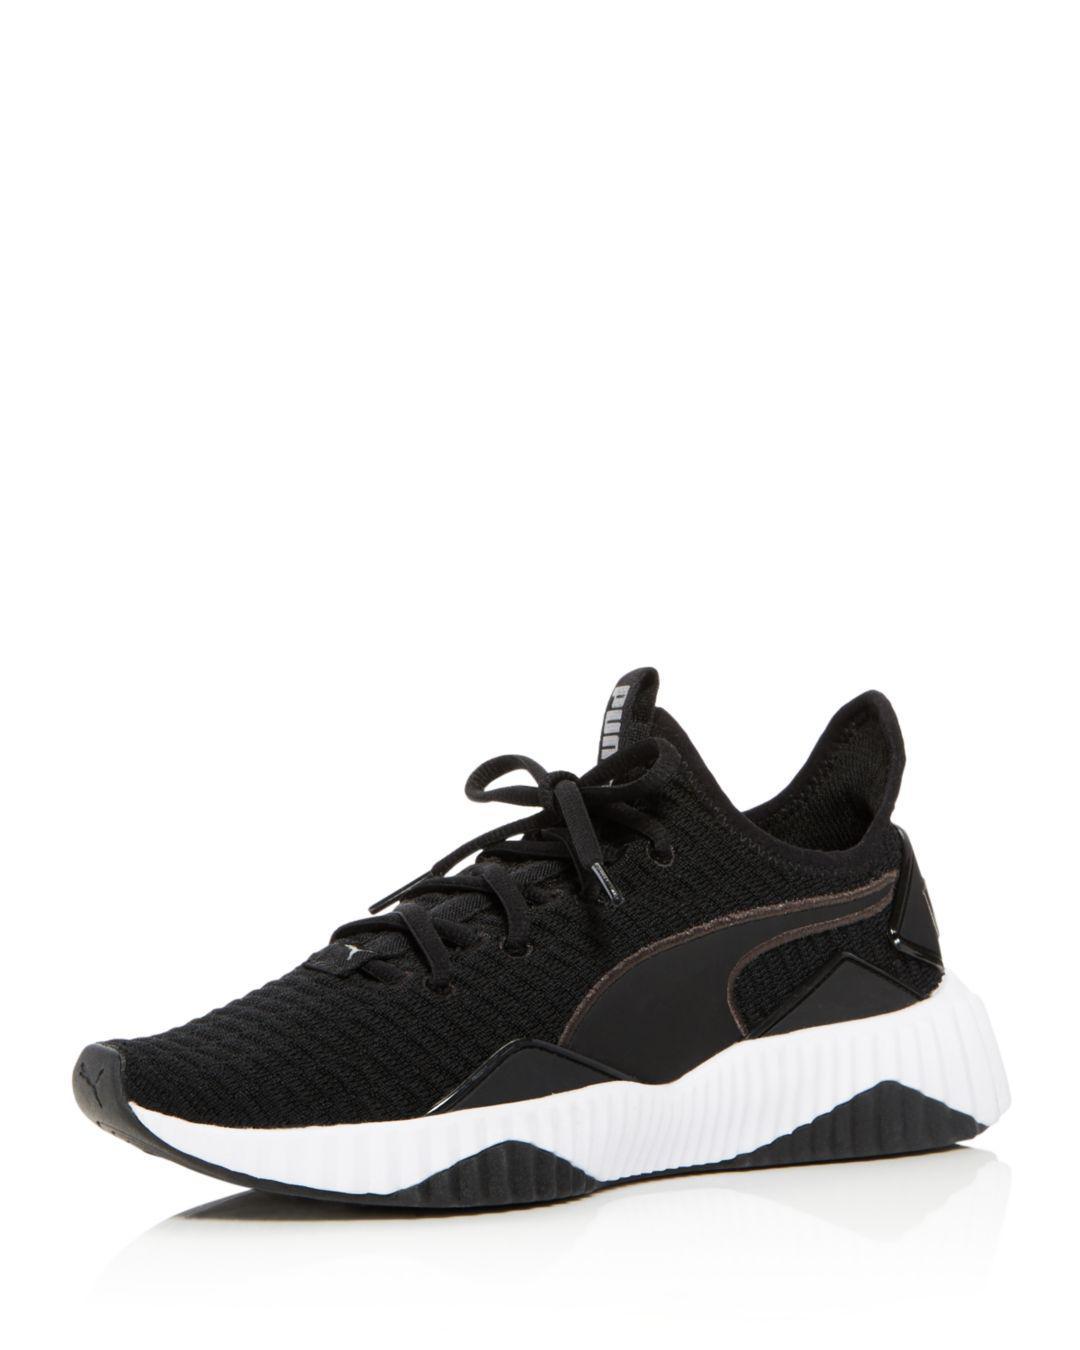 95f40b81f83202 Puma Women s Defy Knit Lace Up Sneakers in Black - Lyst